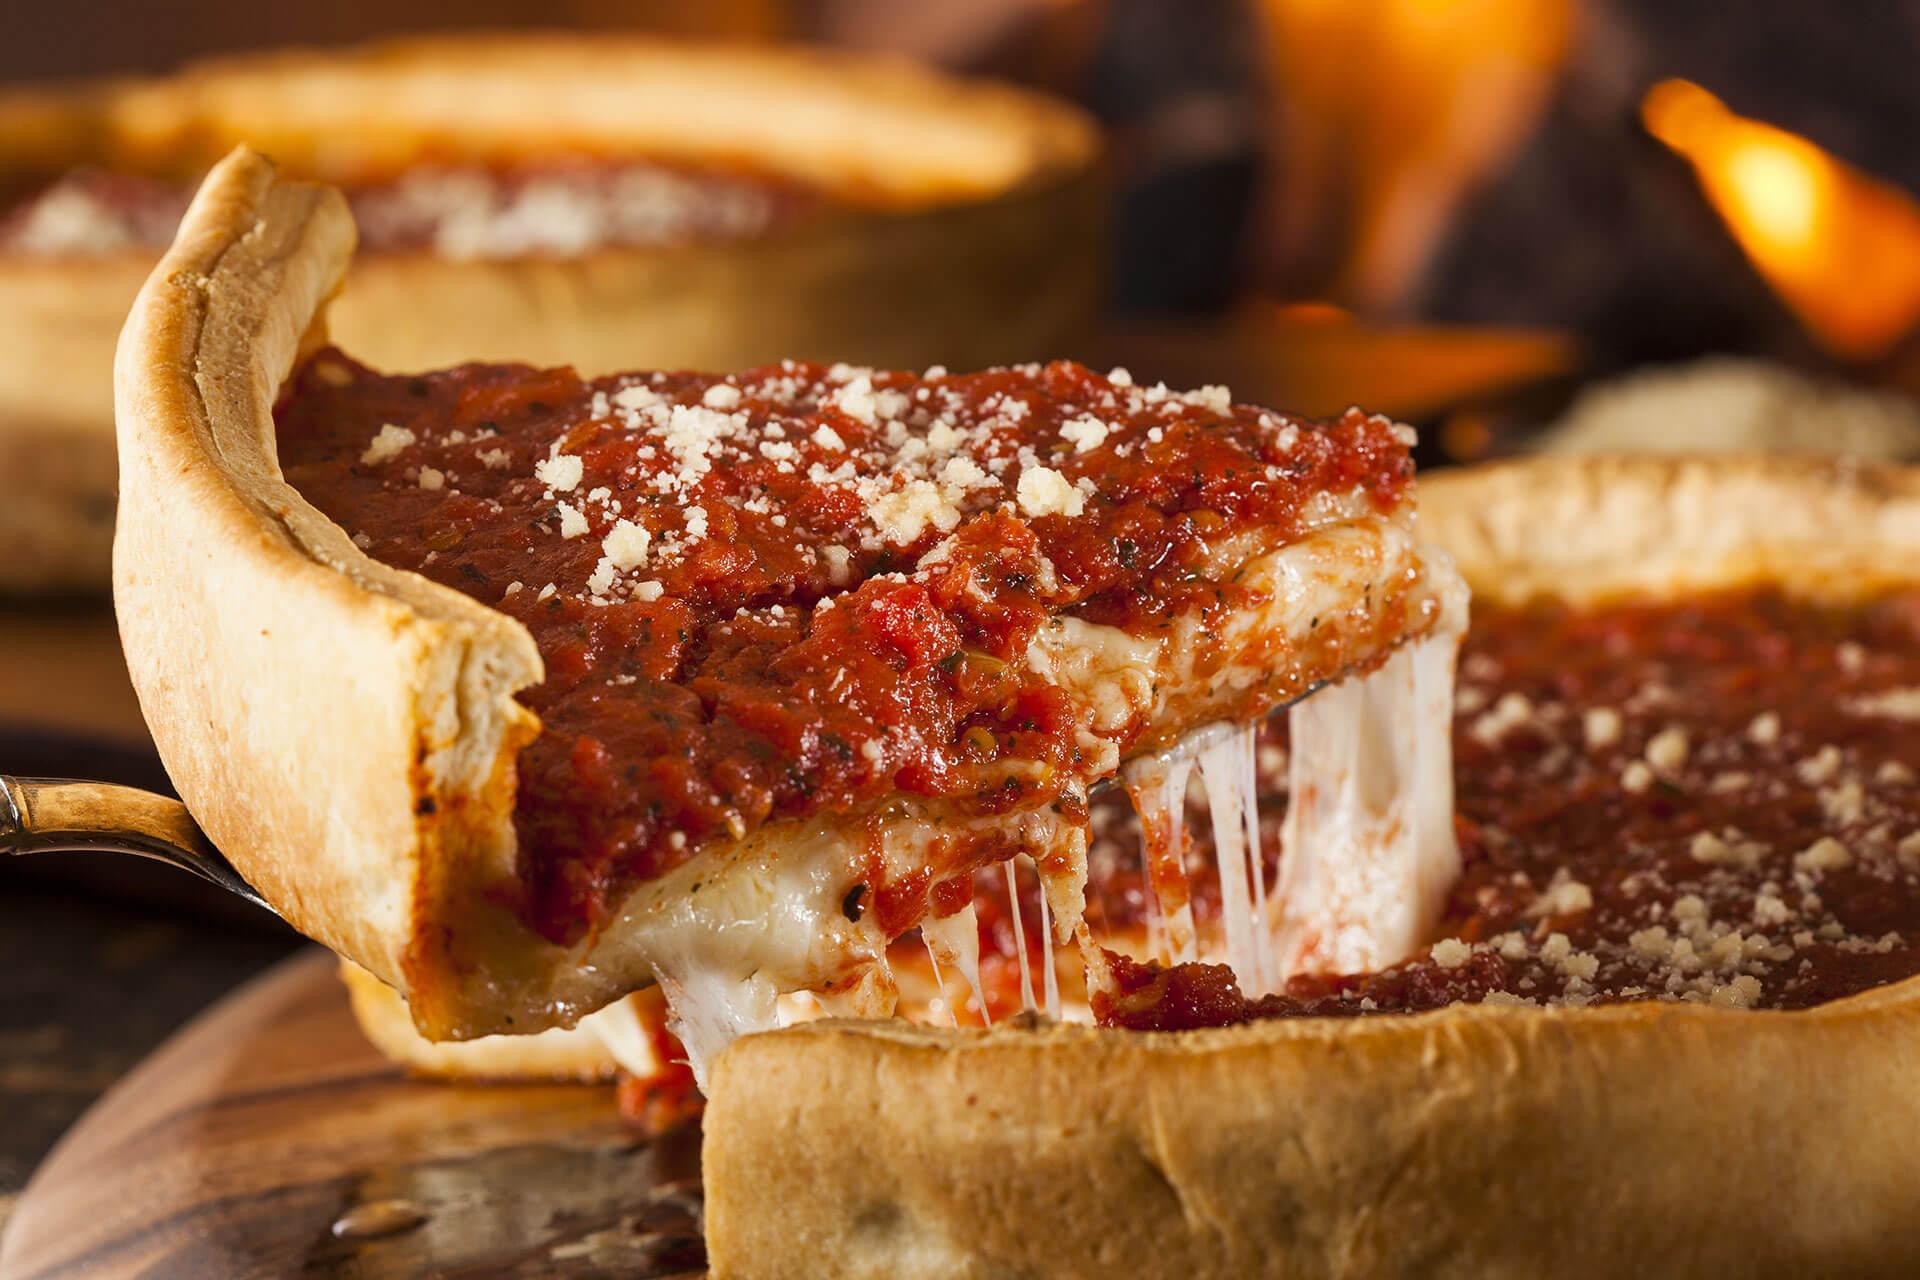 chicago-inspired-deep-dish-pizza-kansas-city-third-coast-pizza-slide1